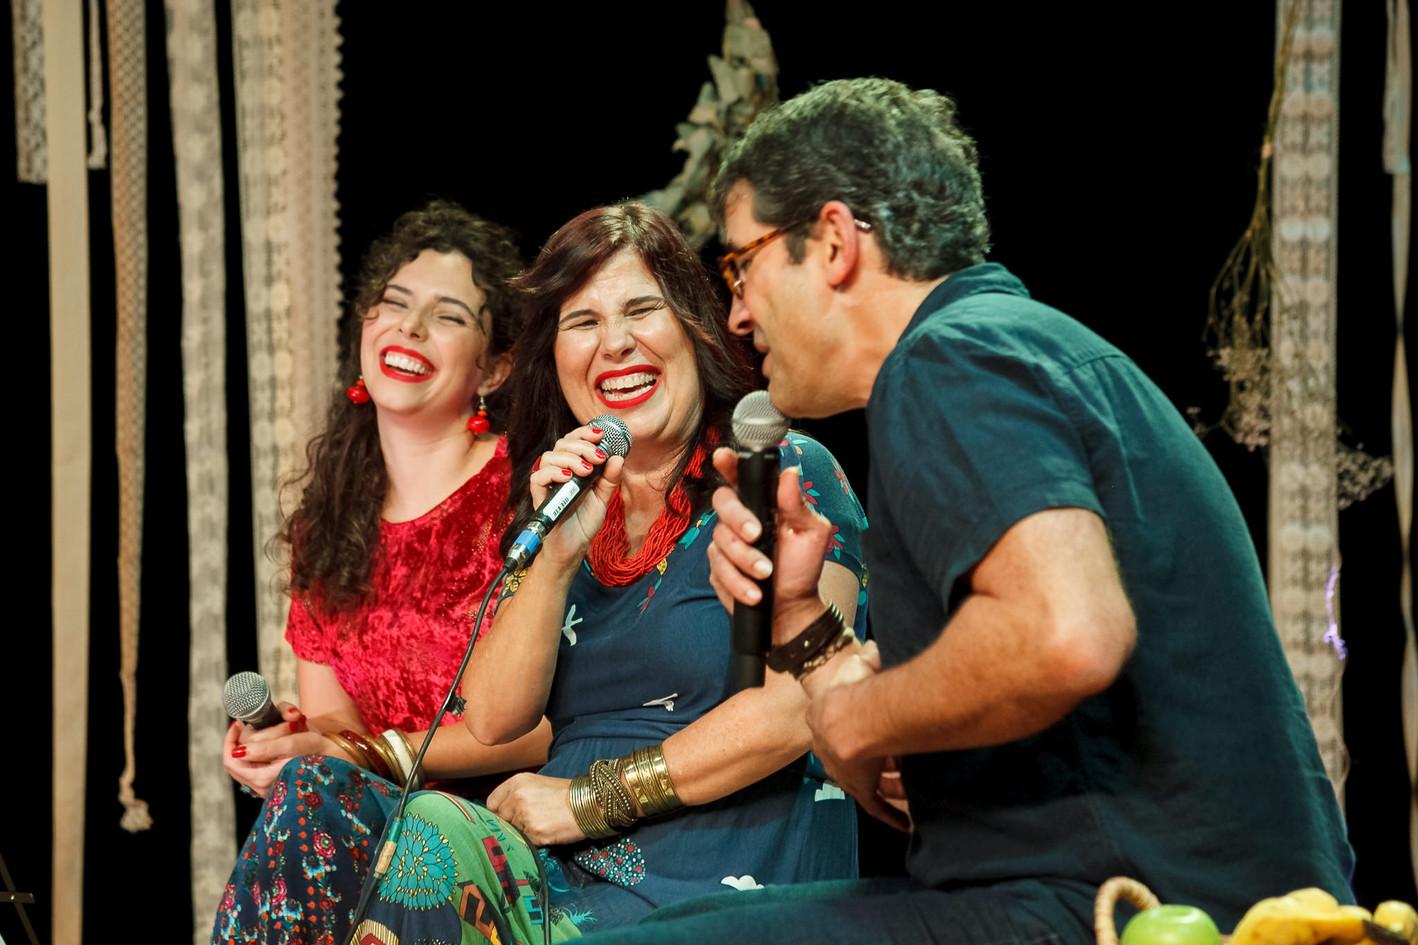 Festival_PenaBranca_Xavantinho_IMG_6001.